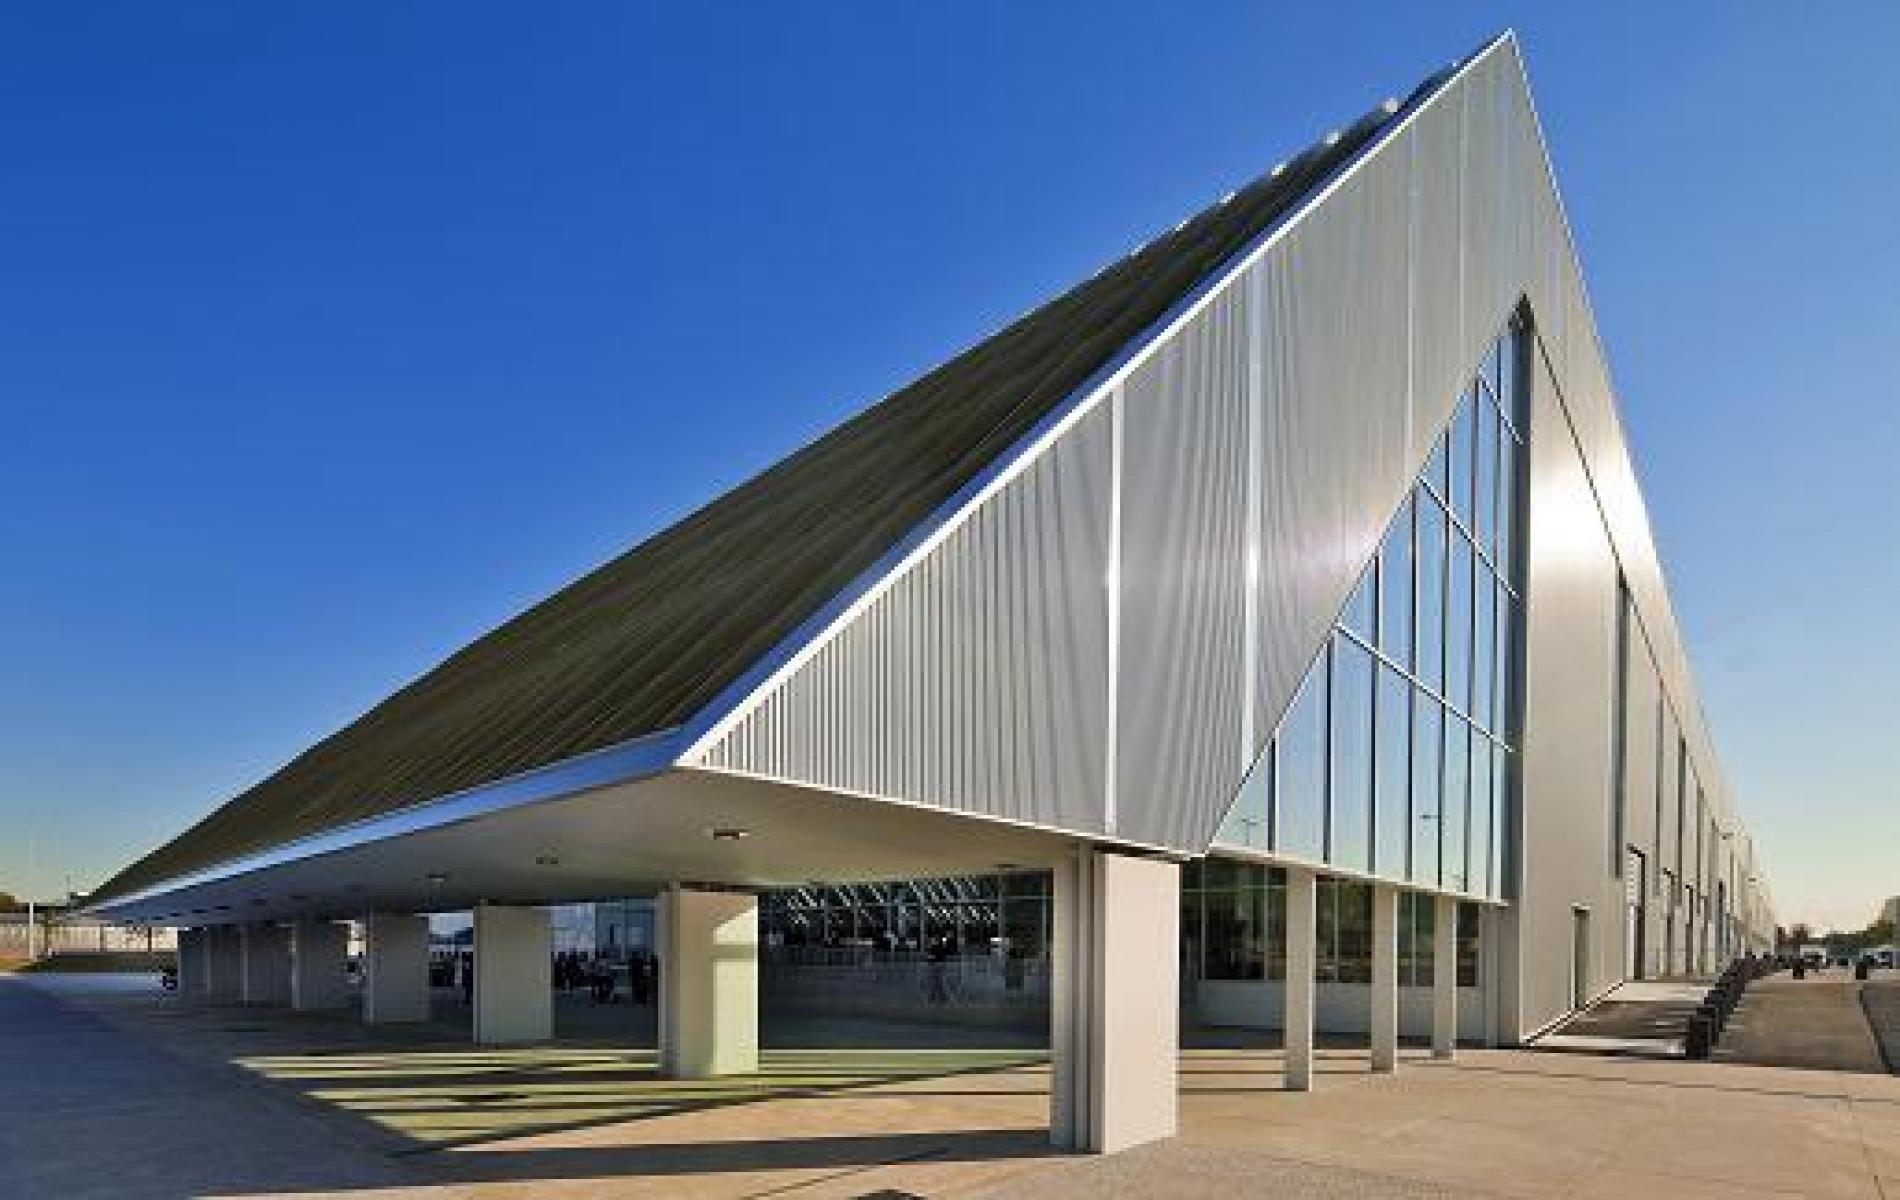 Villepinte Exhibition Center